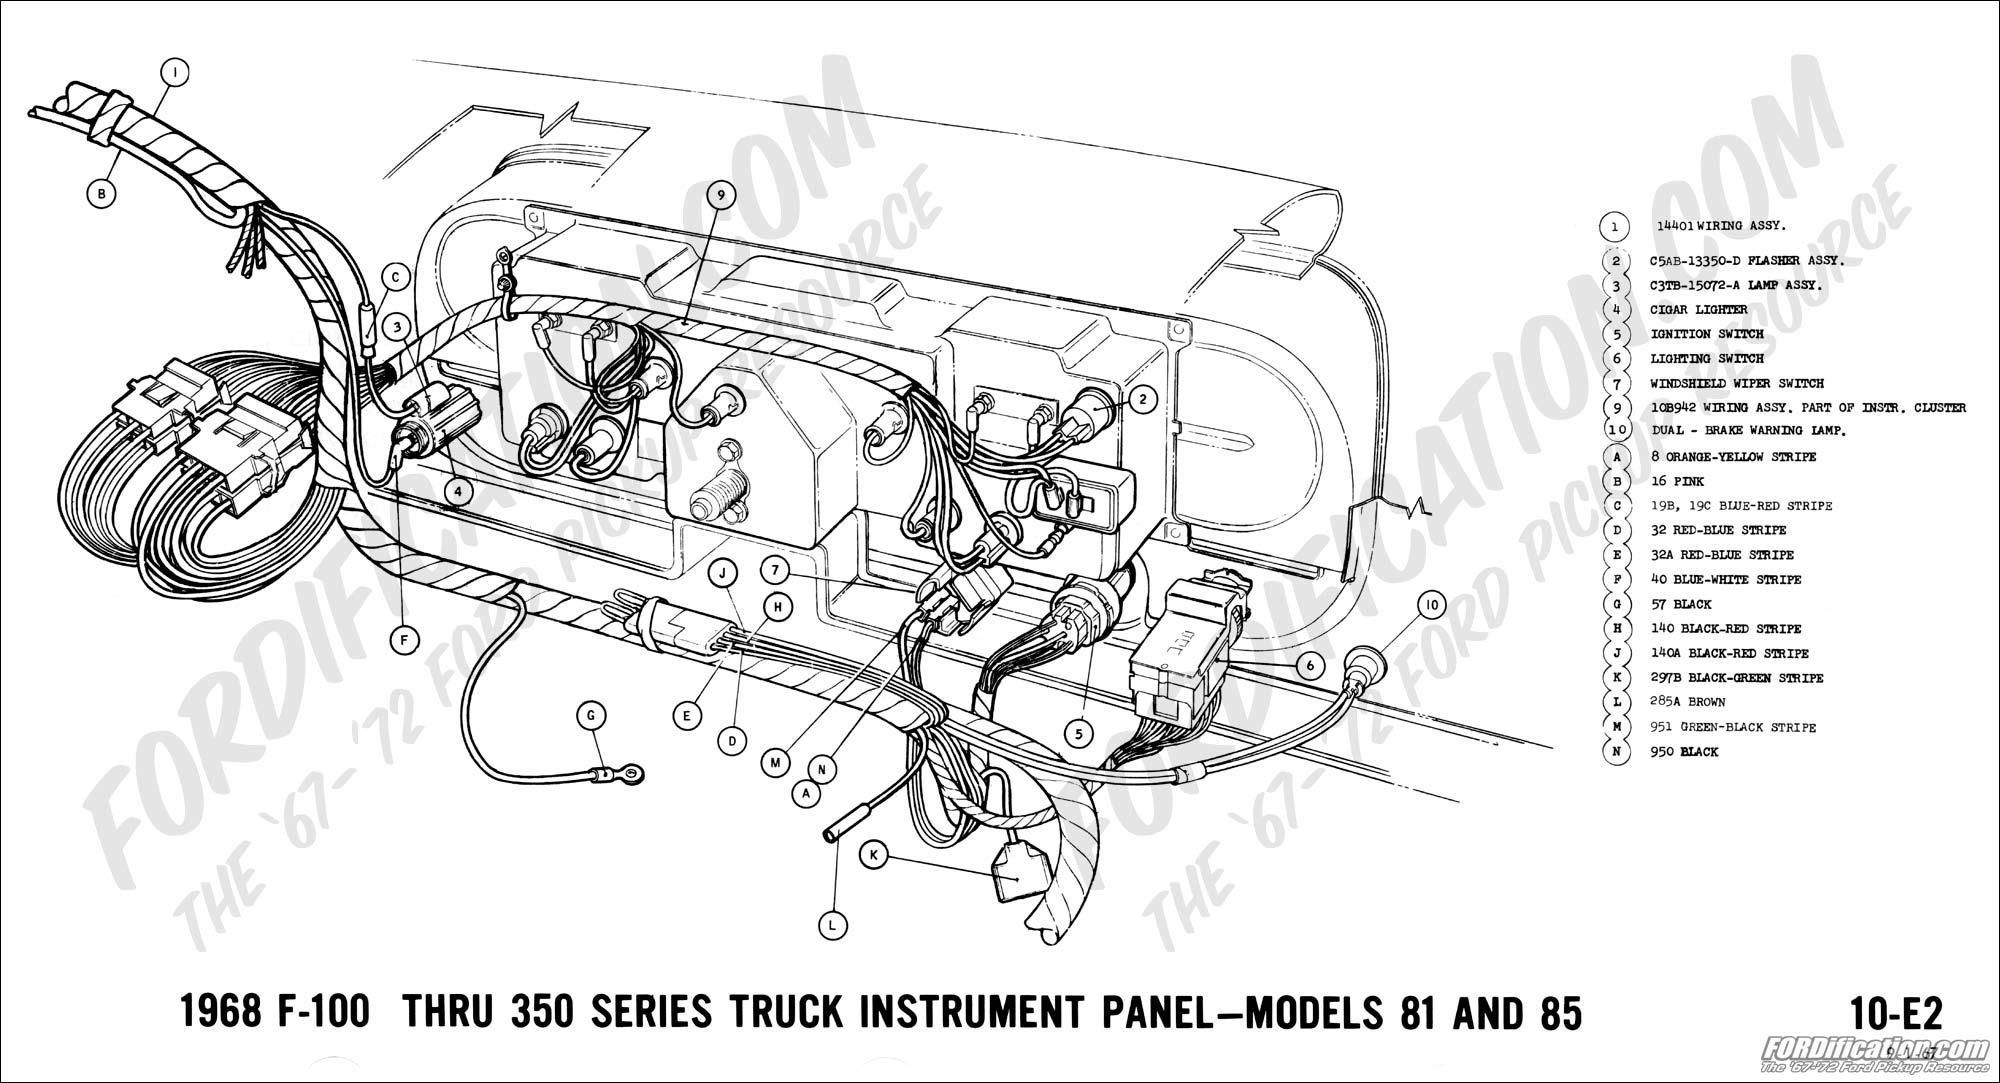 69 camaro fuel gauge wiring diagram